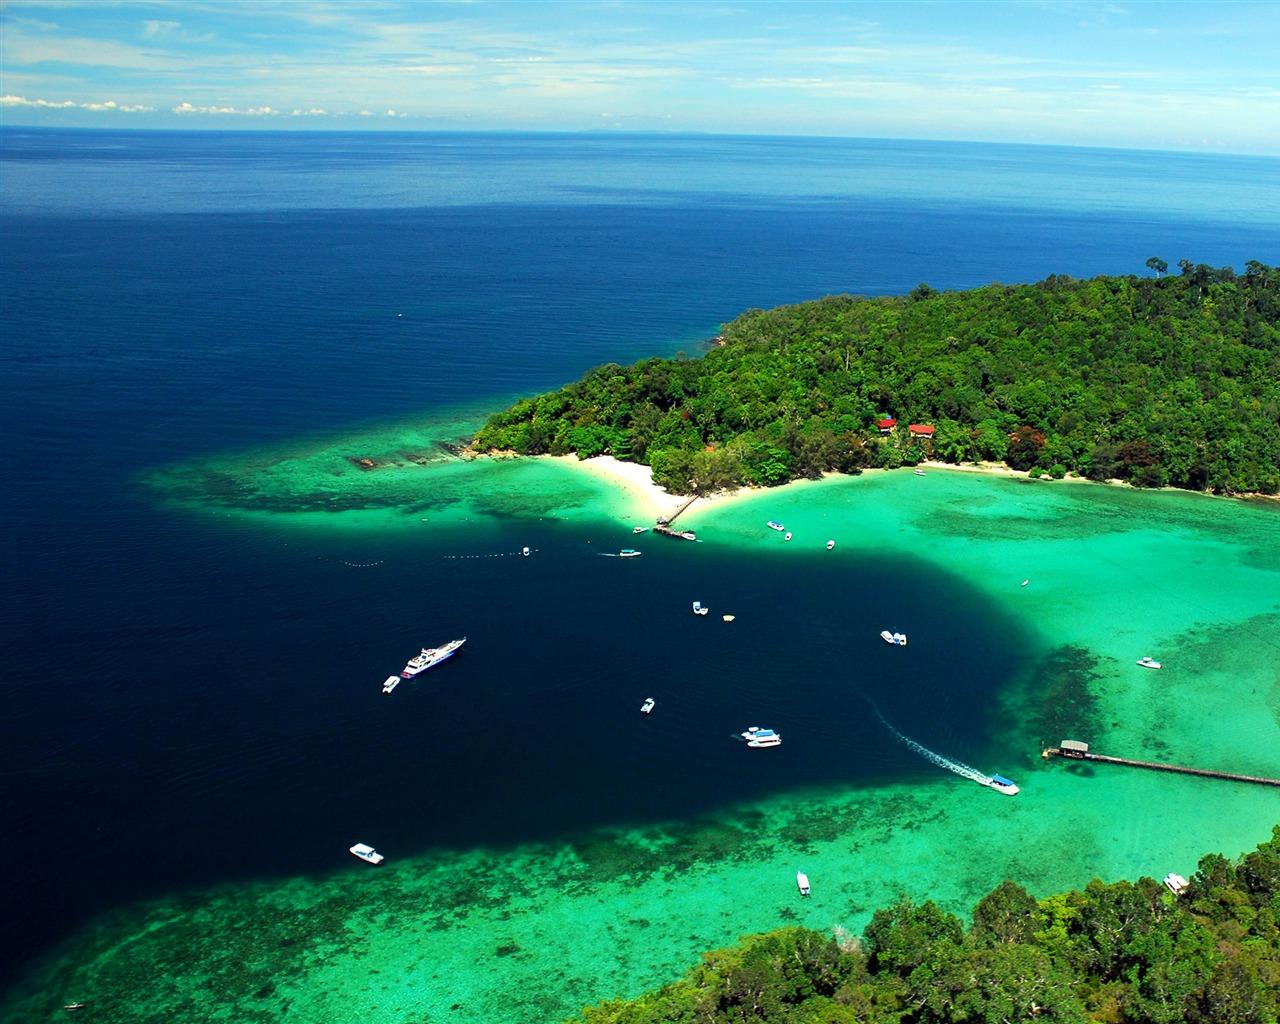 Malaysia Tun Sakaran Marine Park 2016 Bing Desktop